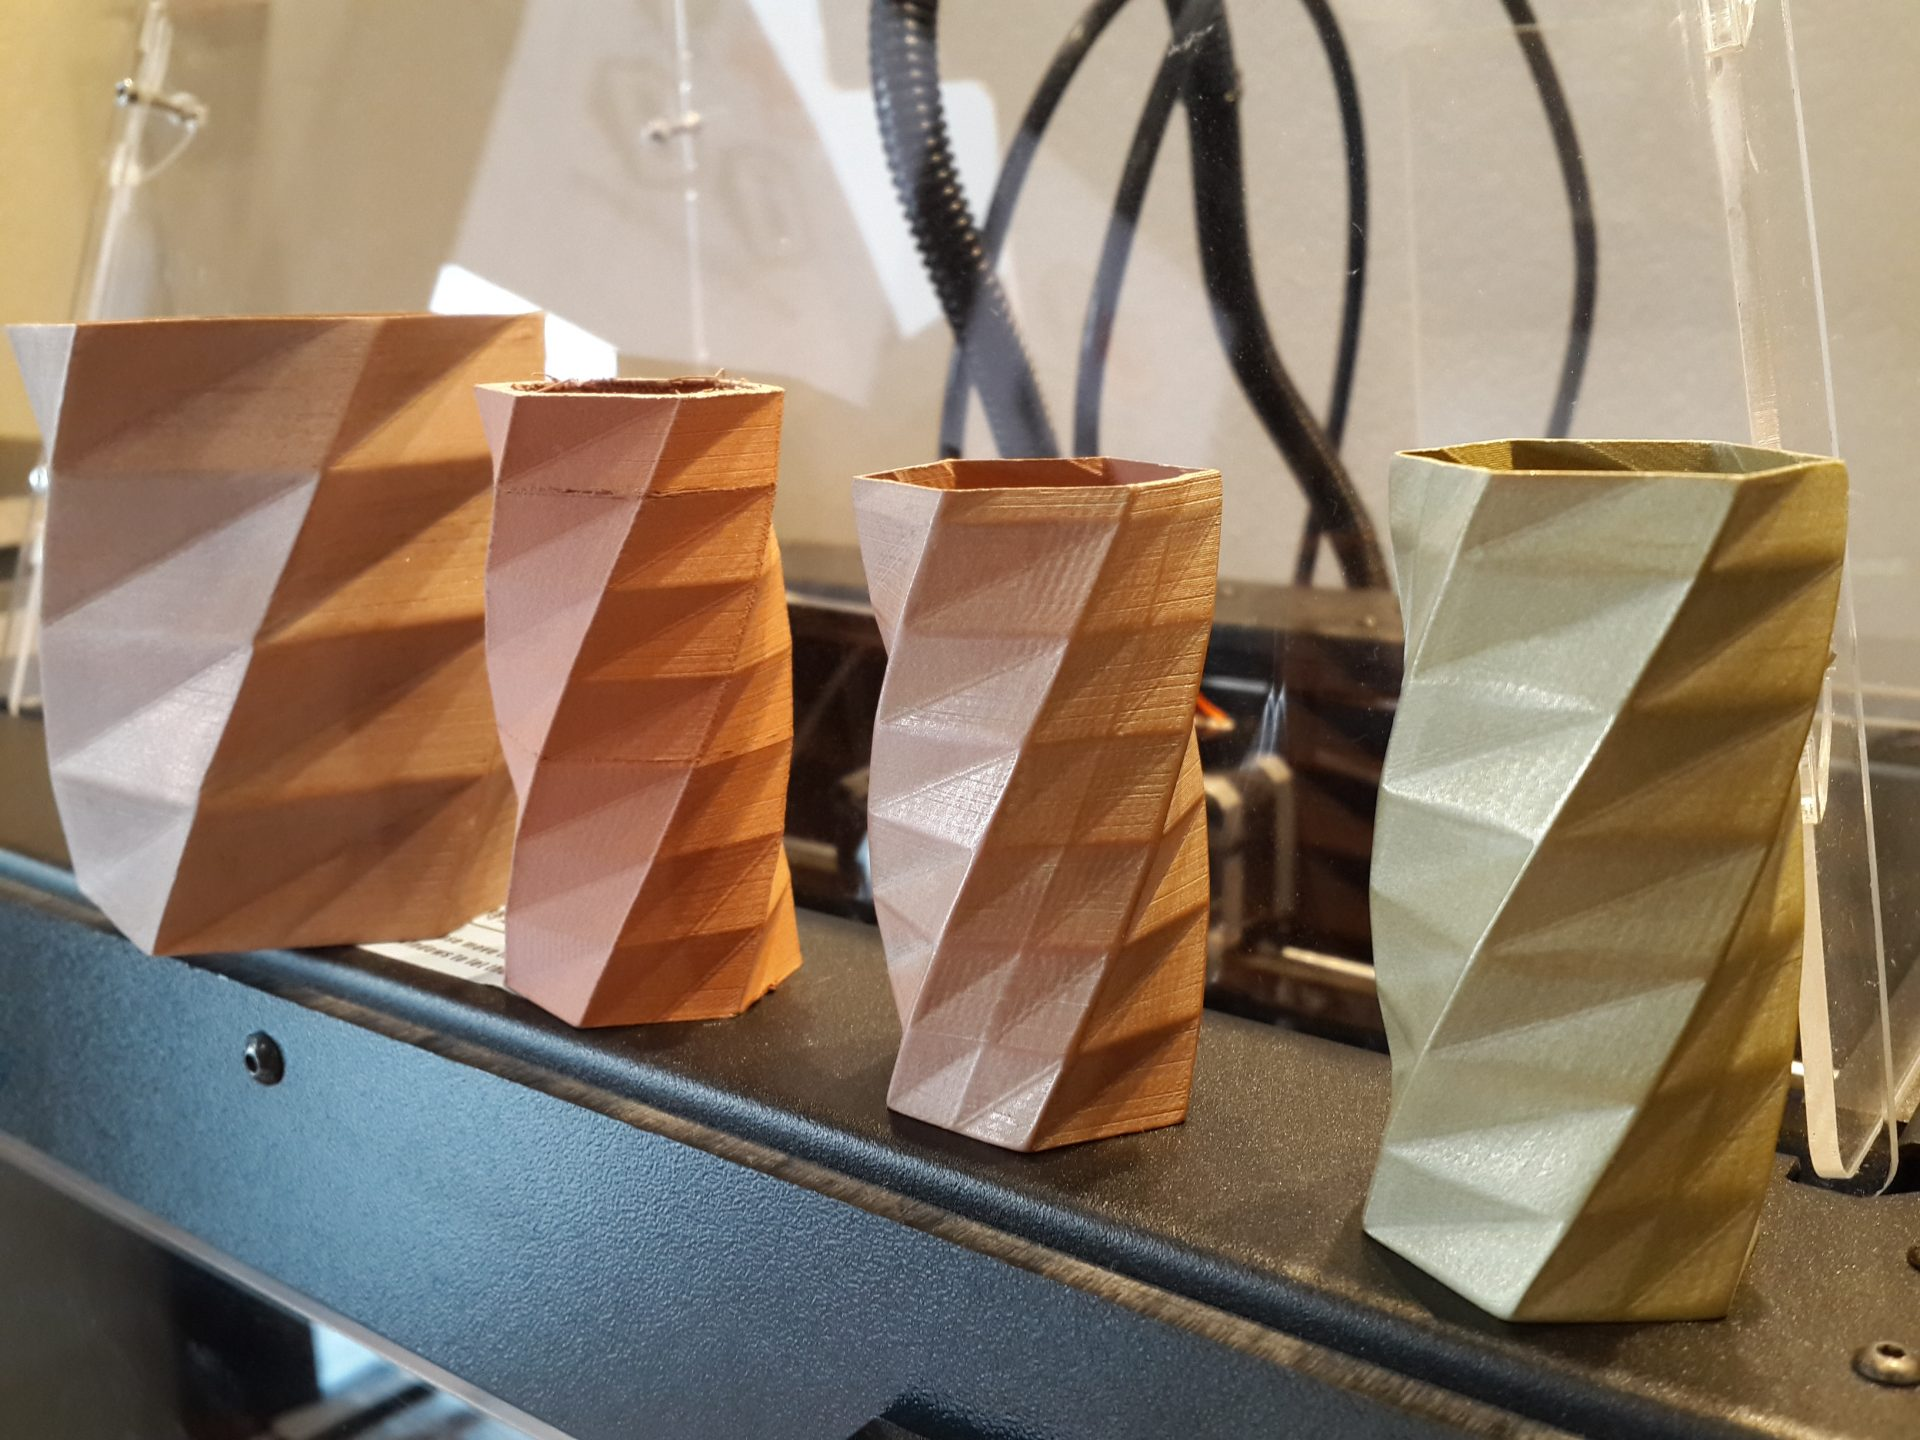 3D Print มาพิมพ์ ทองแดง, ทองเหลือง, บรอนซ์ กันเถอะ